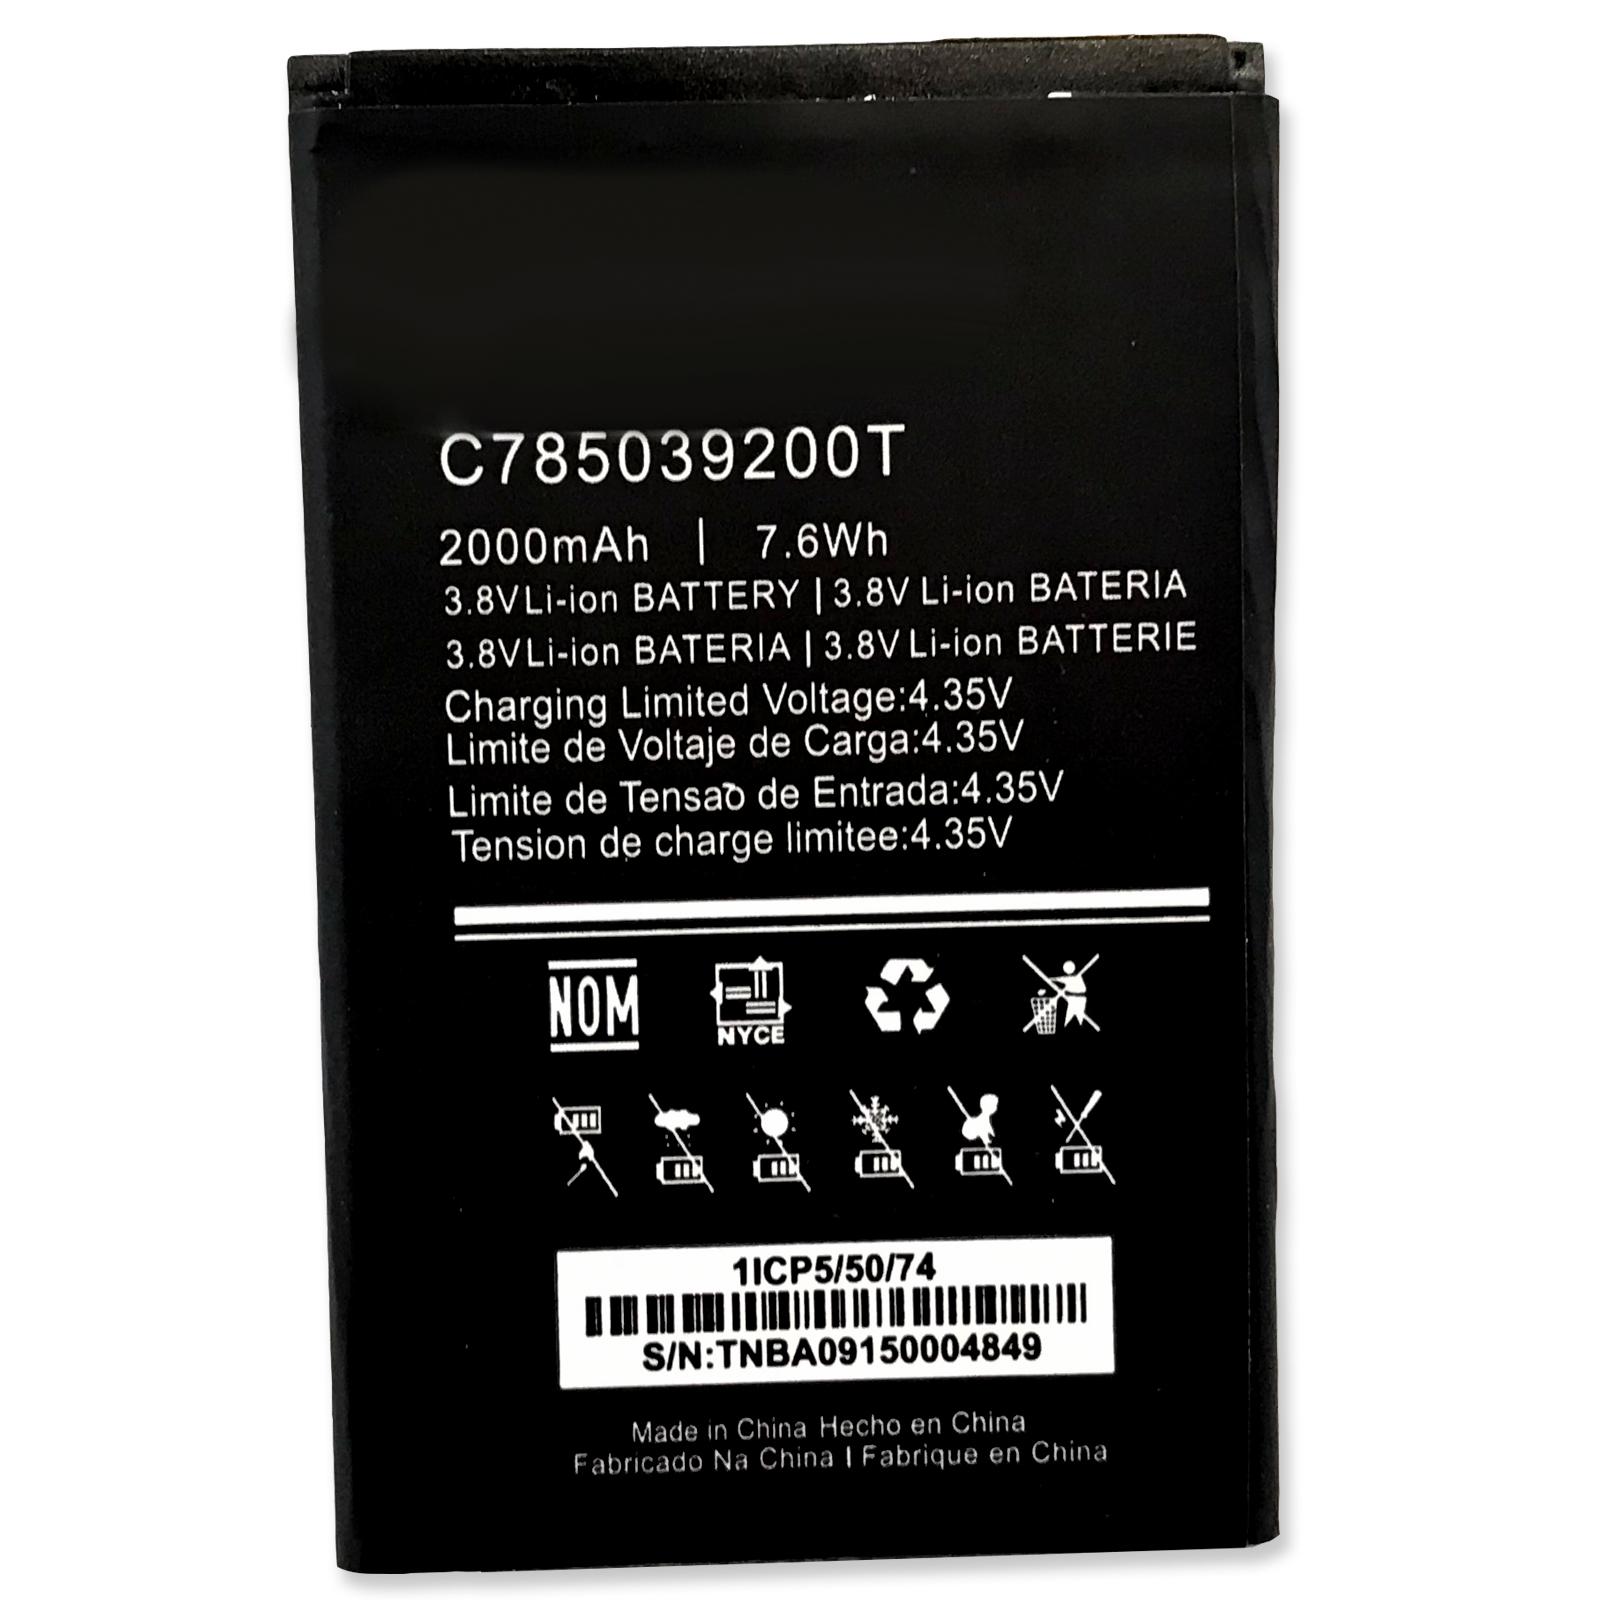 New 2000mAh 3.8V Li-ion Battery For C785039200T BLU DASH M2 D090 D090L D090U / DASH X2 D110 D110U D110L / DASH G D490 D490L D490U